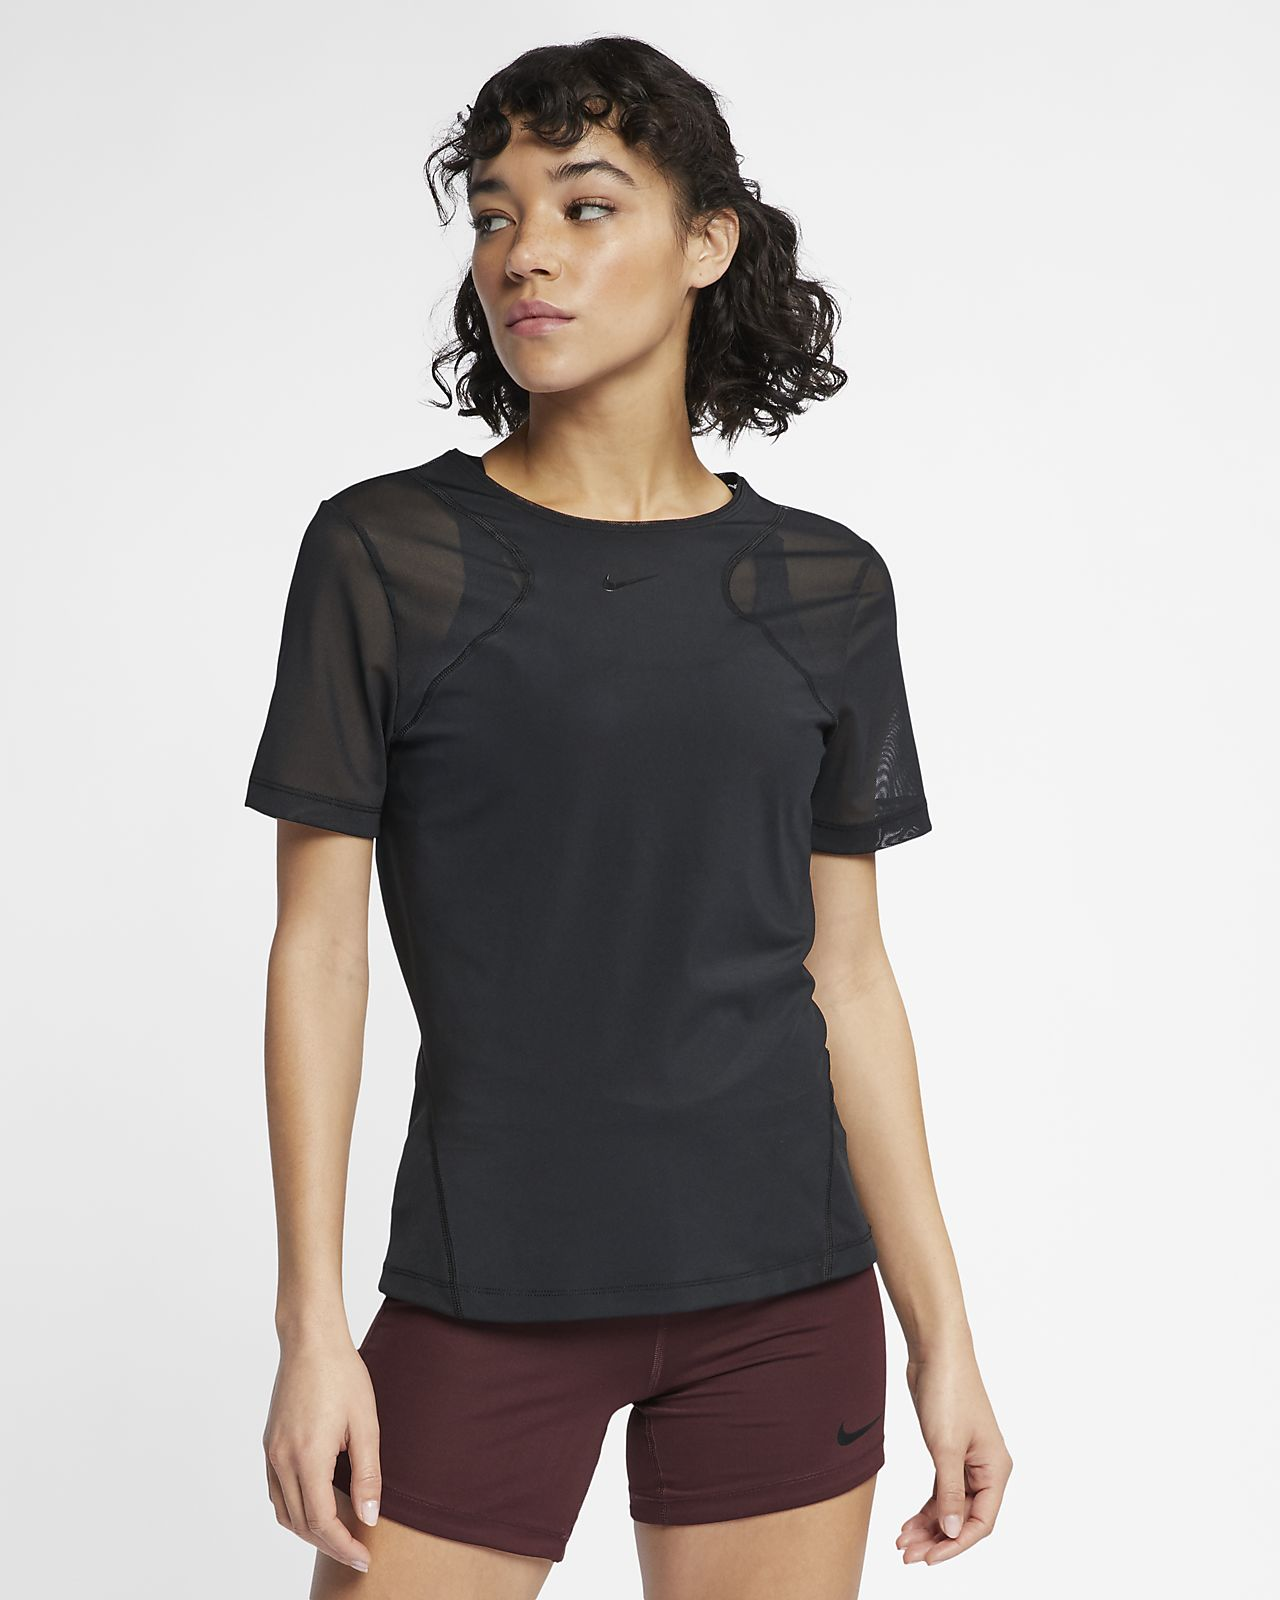 Nike Pro HyperCool Kurzarmoberteil für Damen